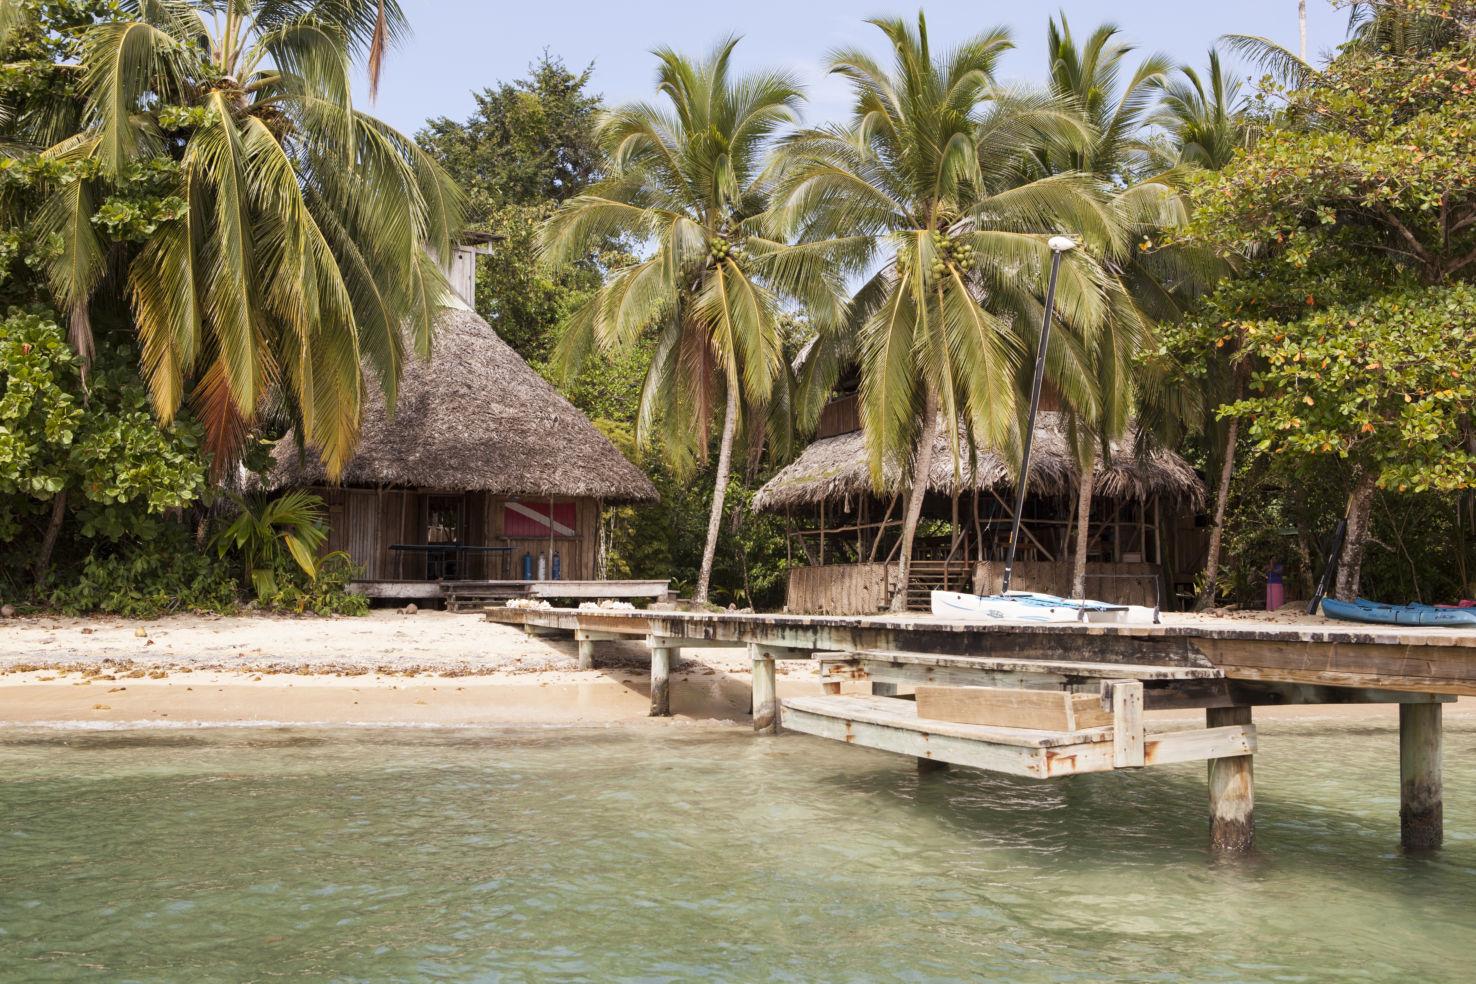 panama, bocas del toro, central america, caribbean, archipelago